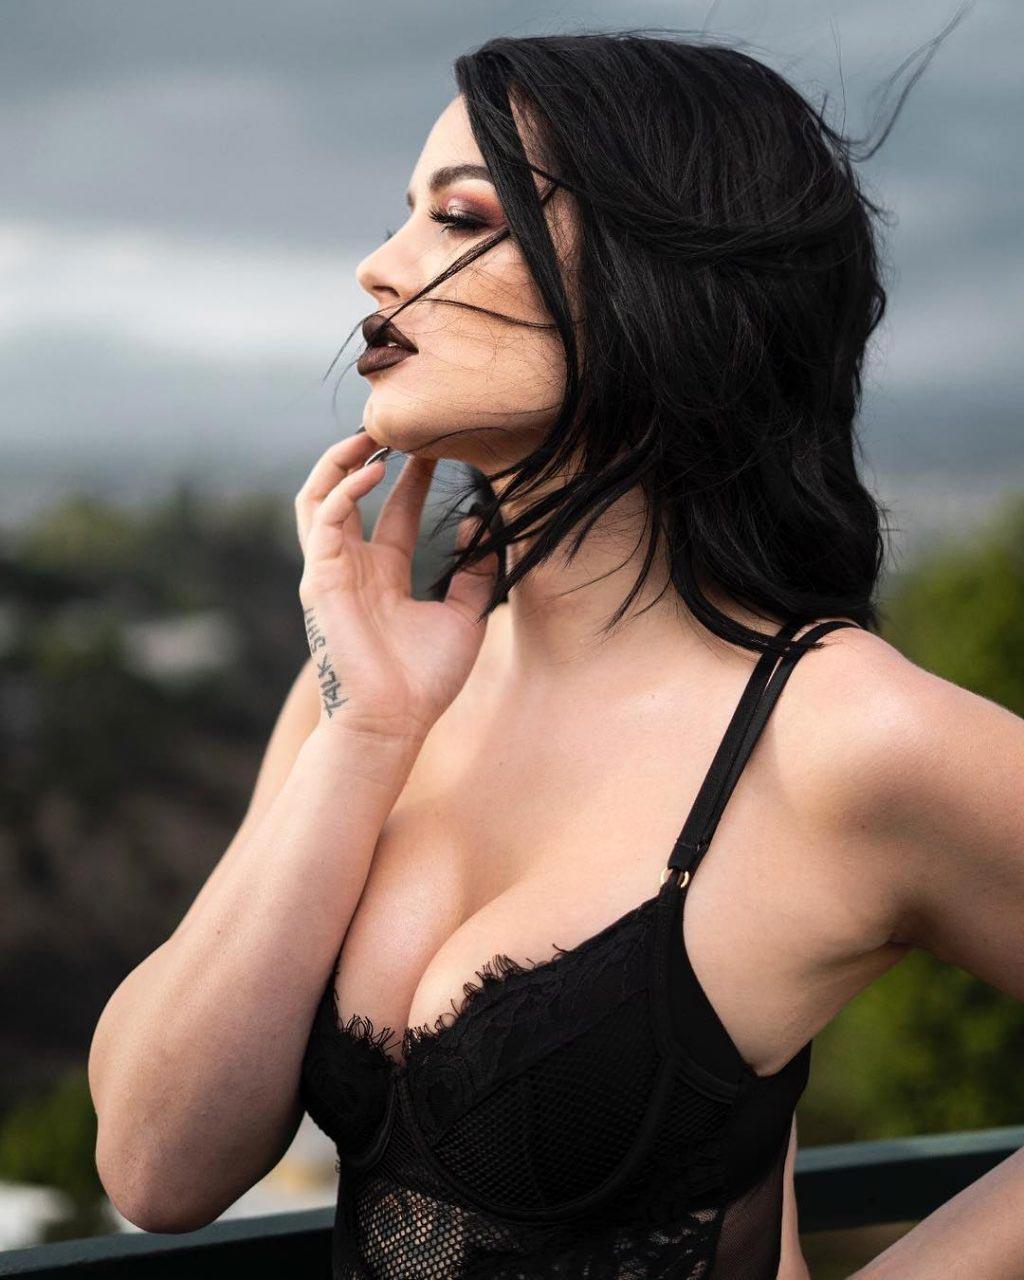 Paige wwe sexy